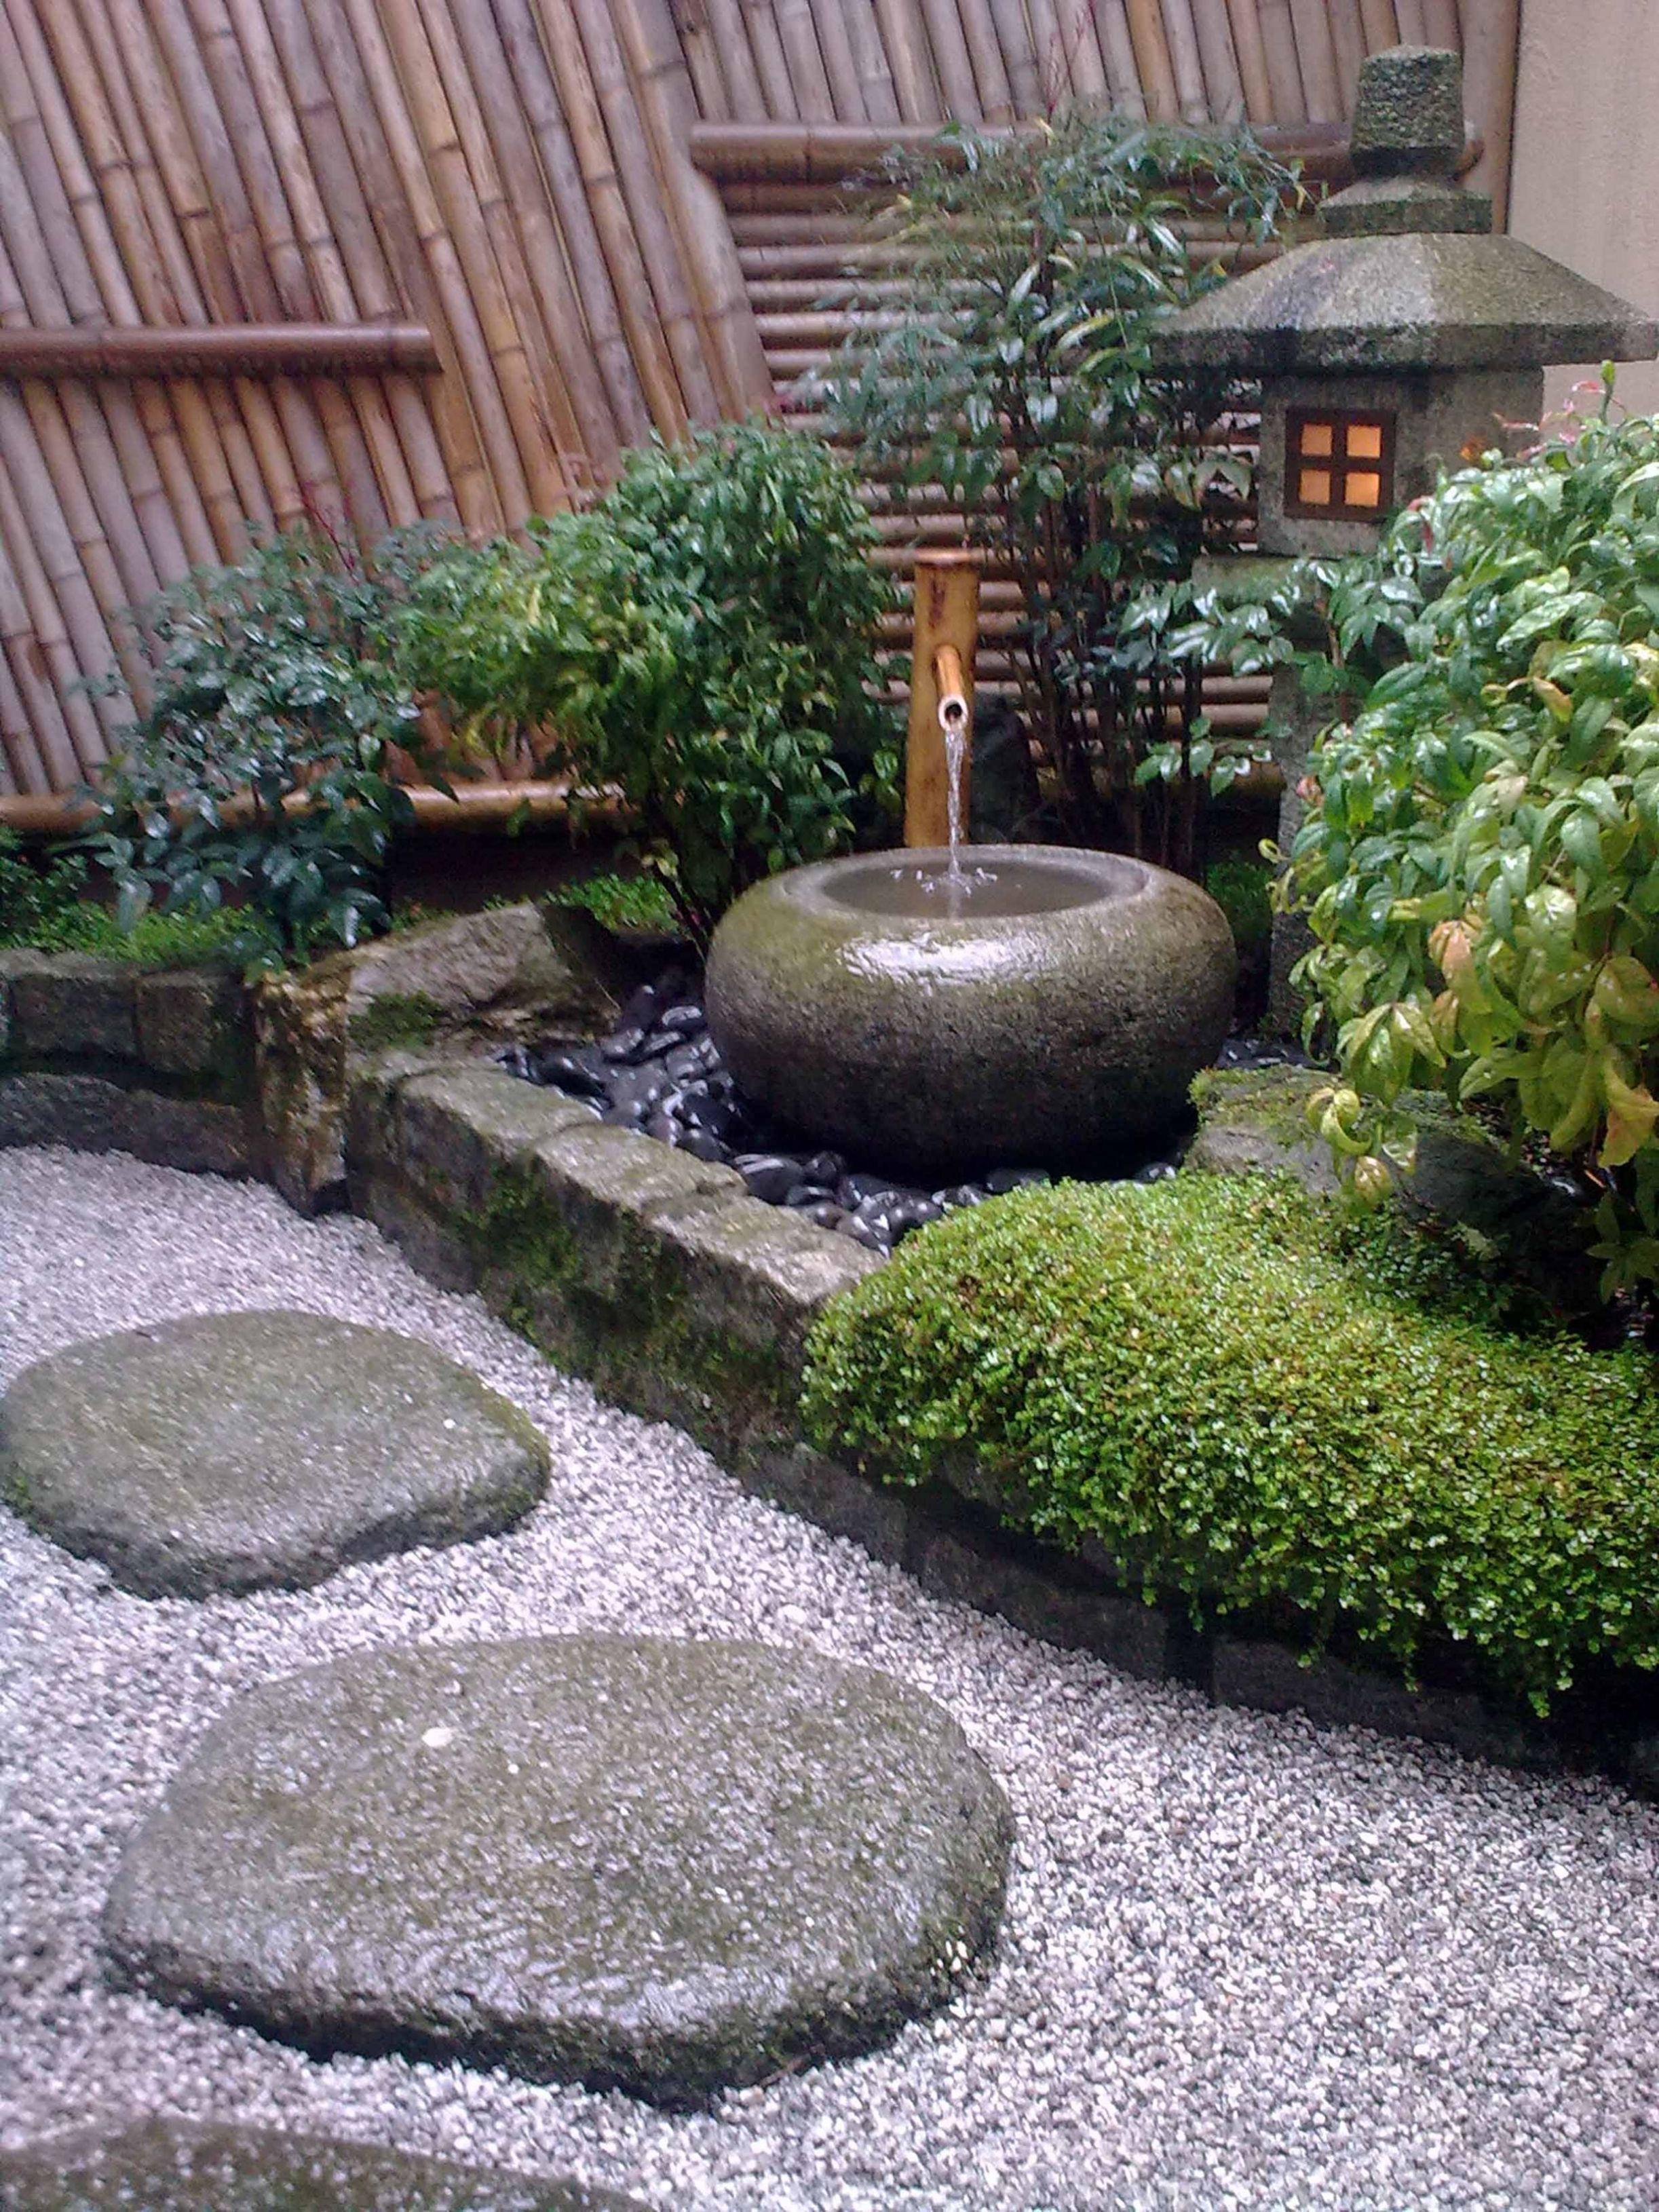 76 beautiful zen garden ideas for backyard 400 japanese on beautiful backyard garden design ideas and remodel create your extraordinary garden id=85462